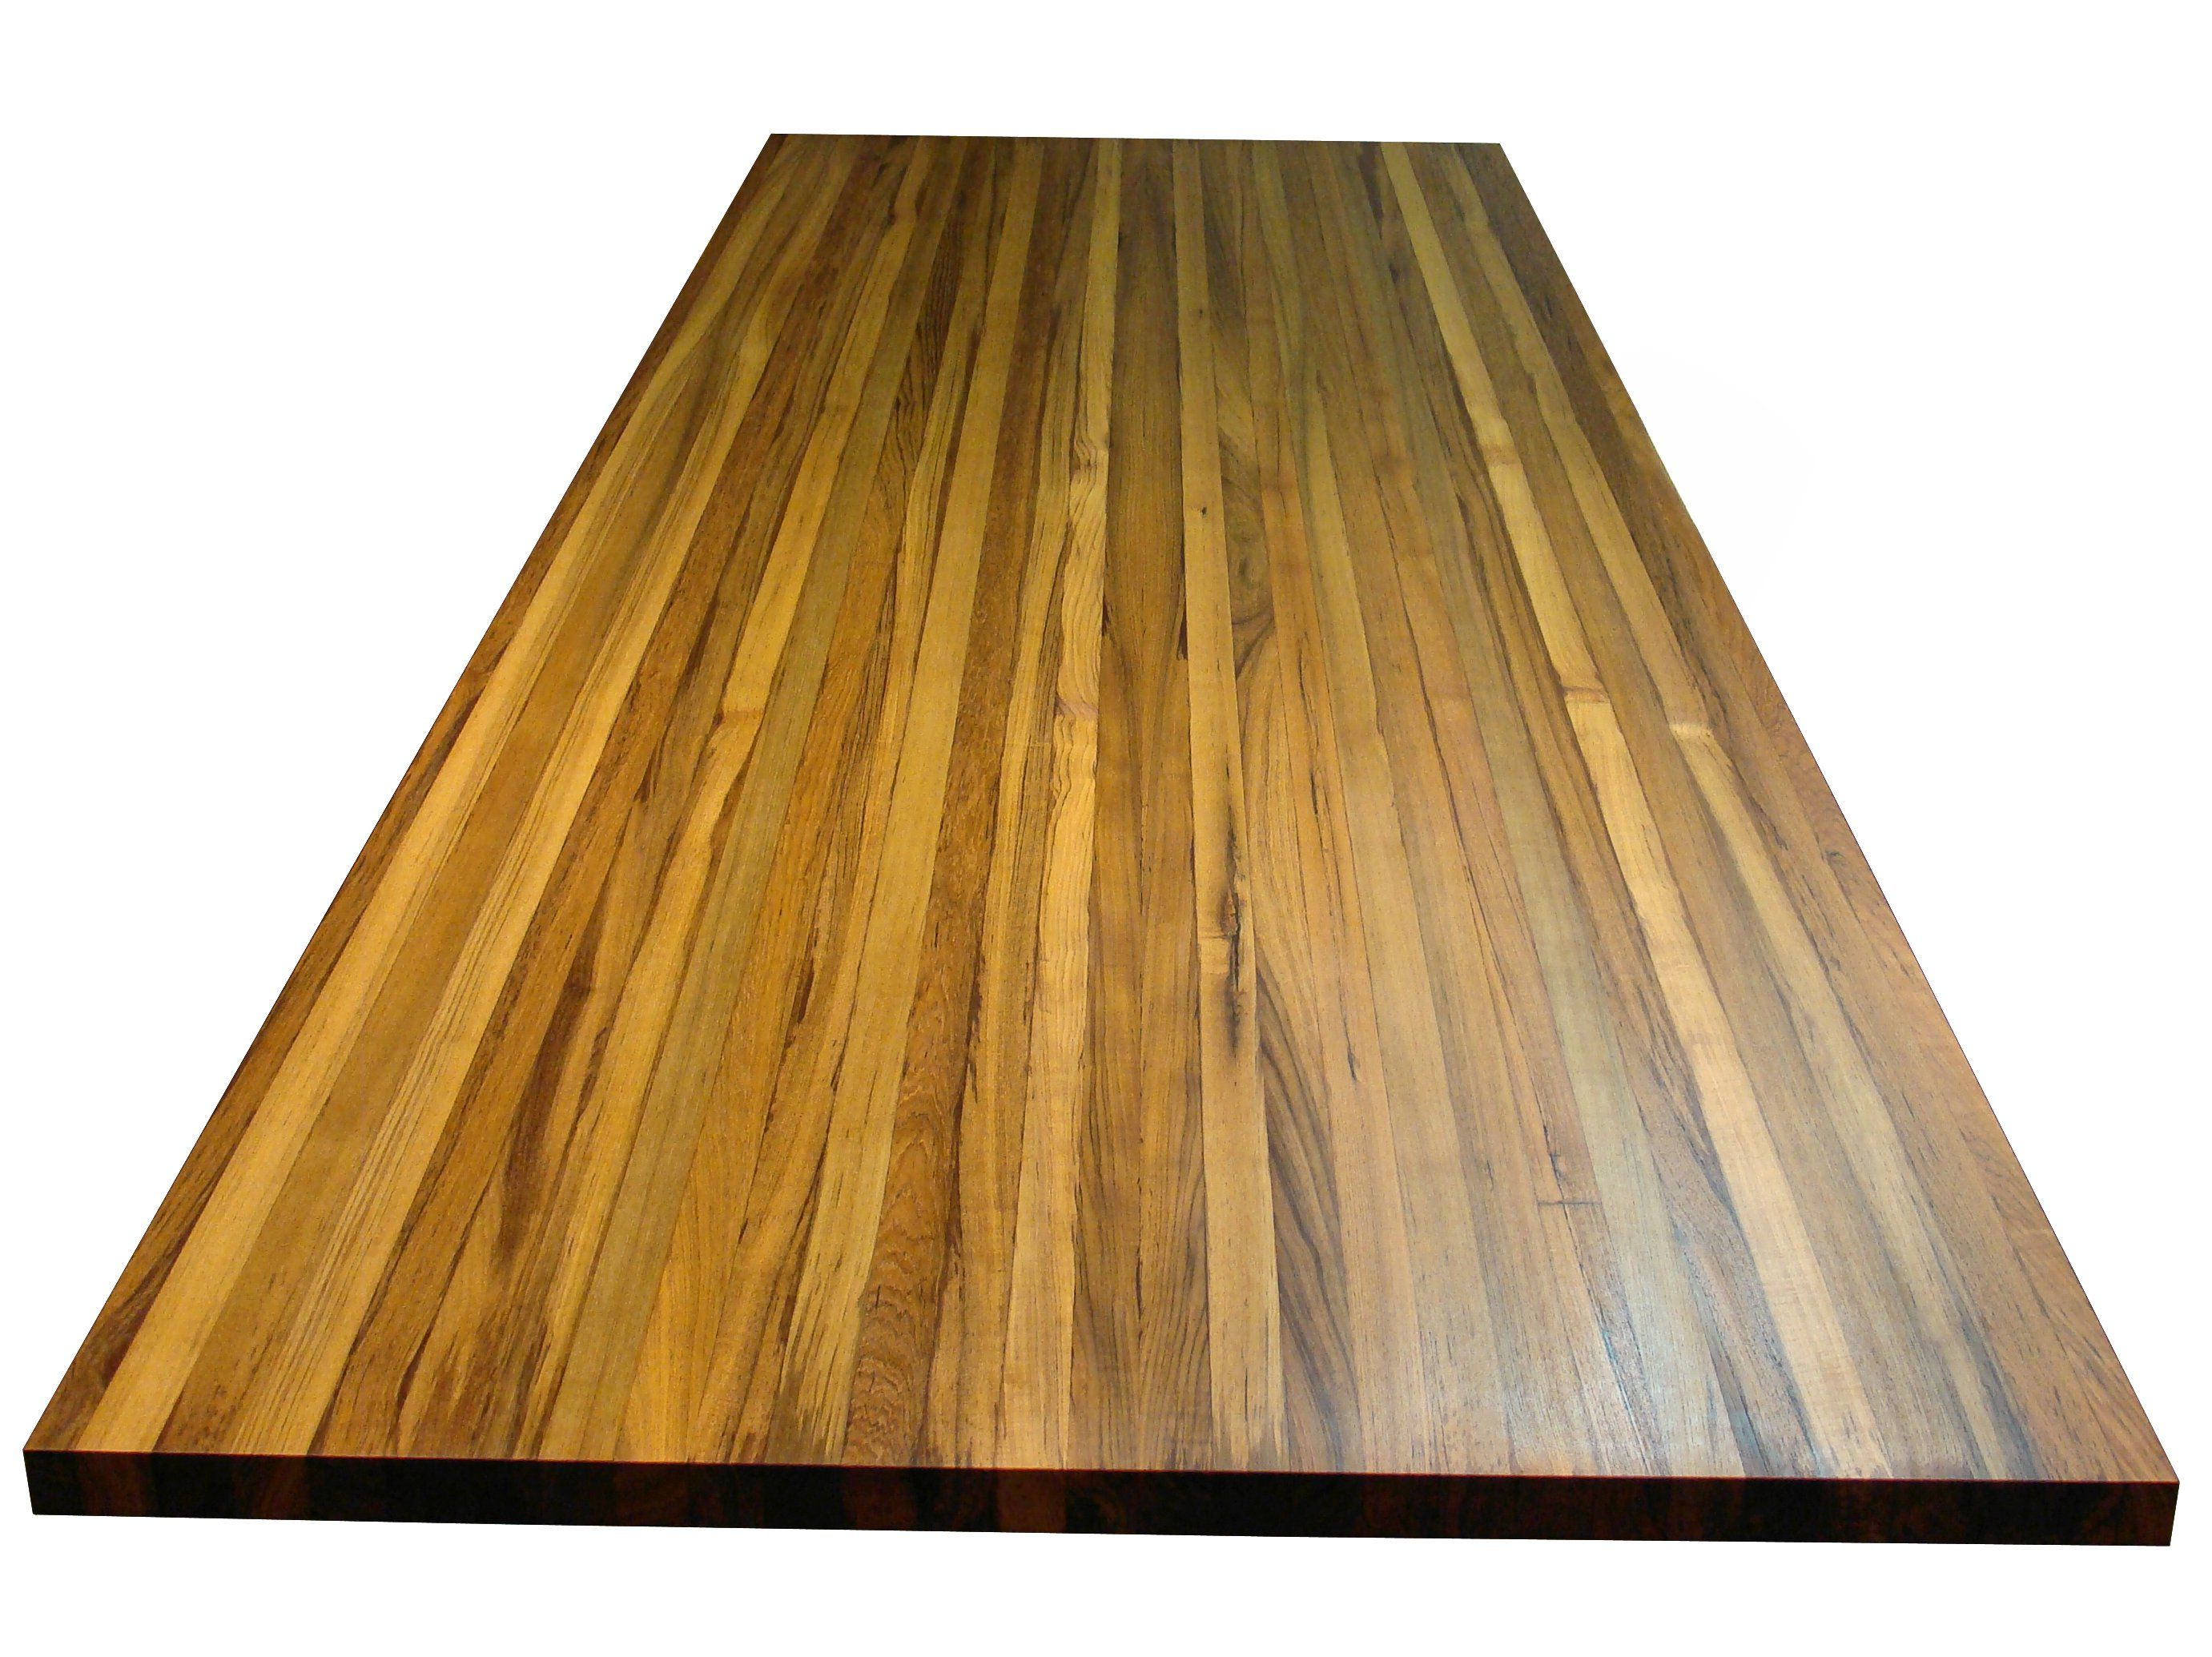 teak wood countertop photo gallery by devos custom woodworking. Black Bedroom Furniture Sets. Home Design Ideas